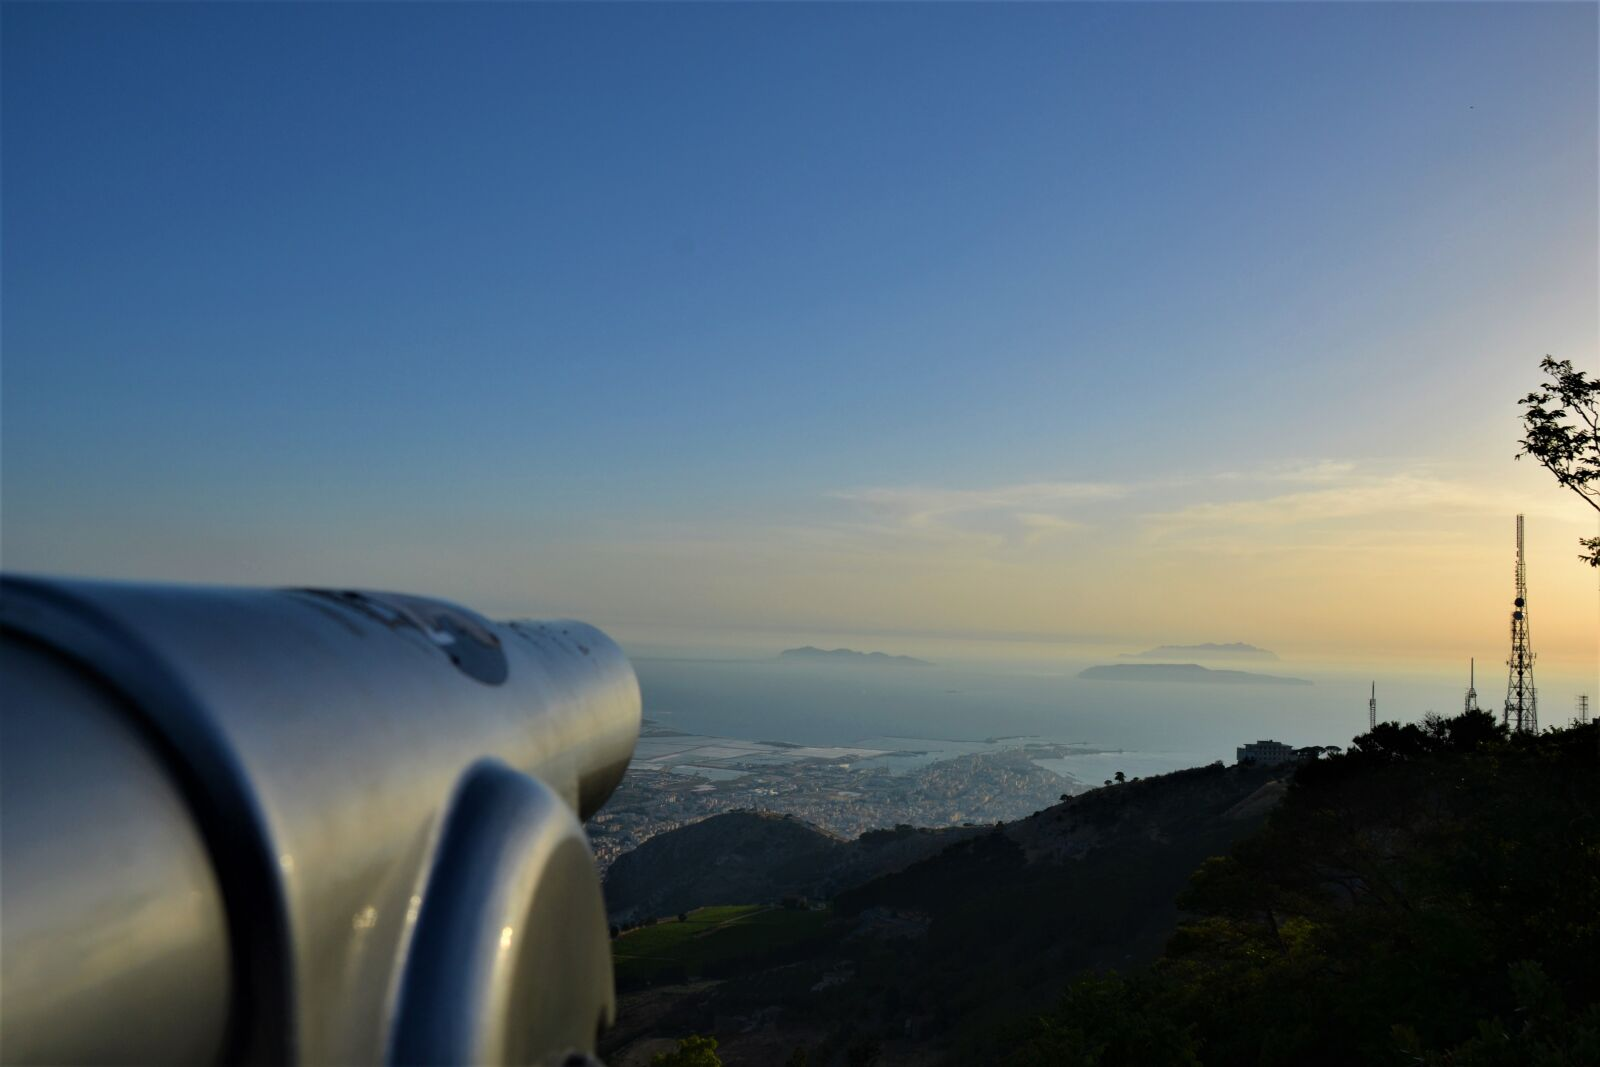 Nikon D3100 sample photo